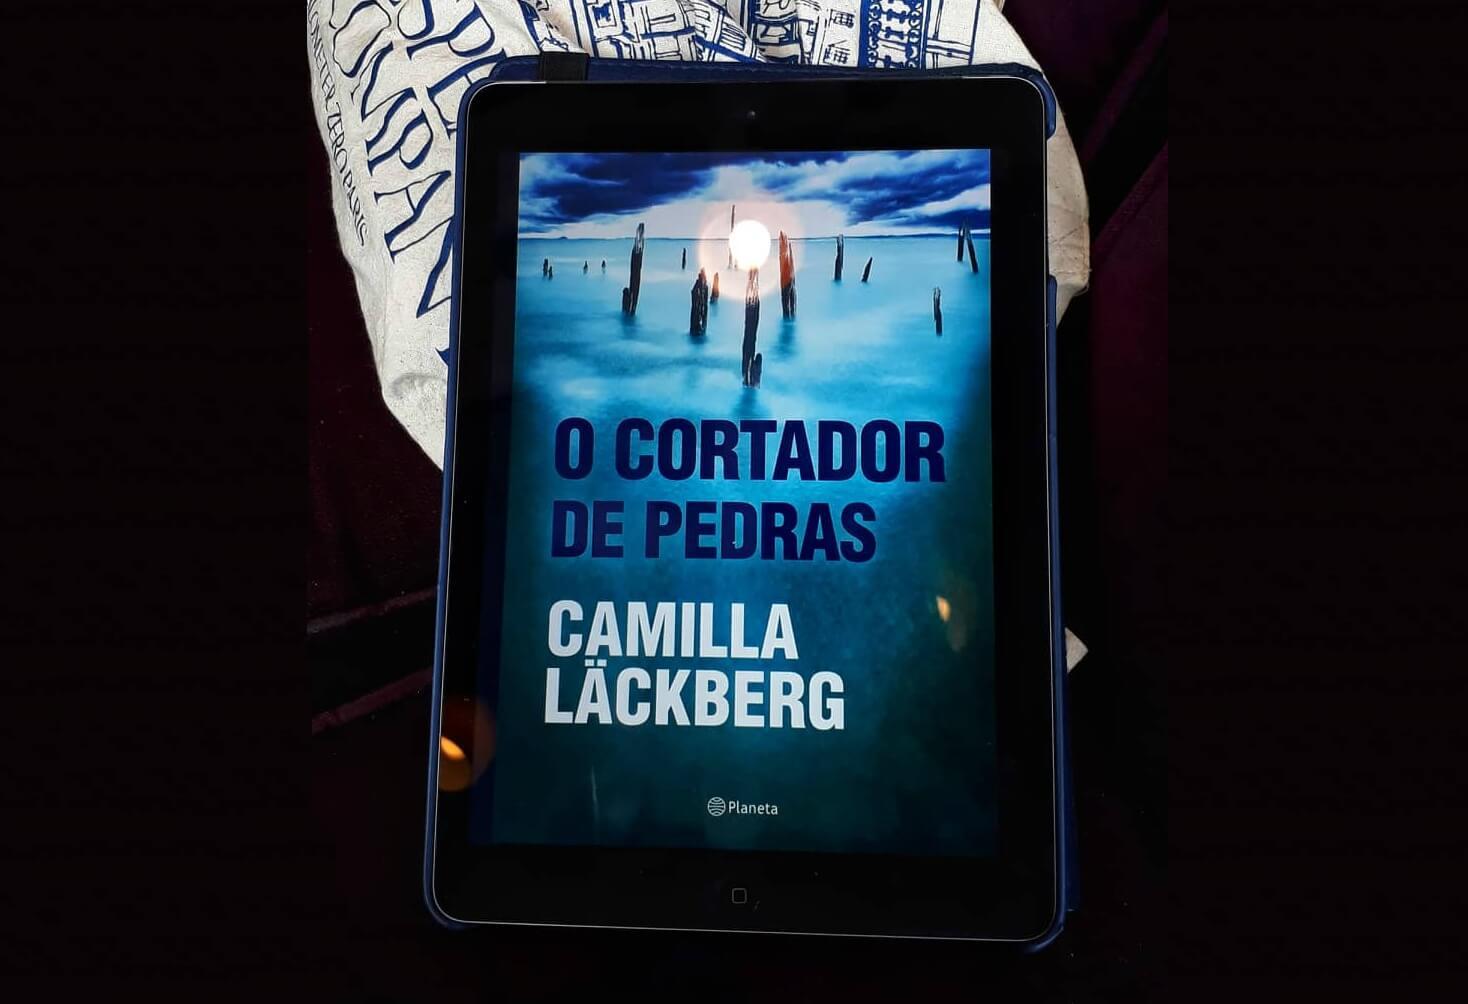 O Cortador de Pedras, um suspense nórdico de Camilla Läckberg